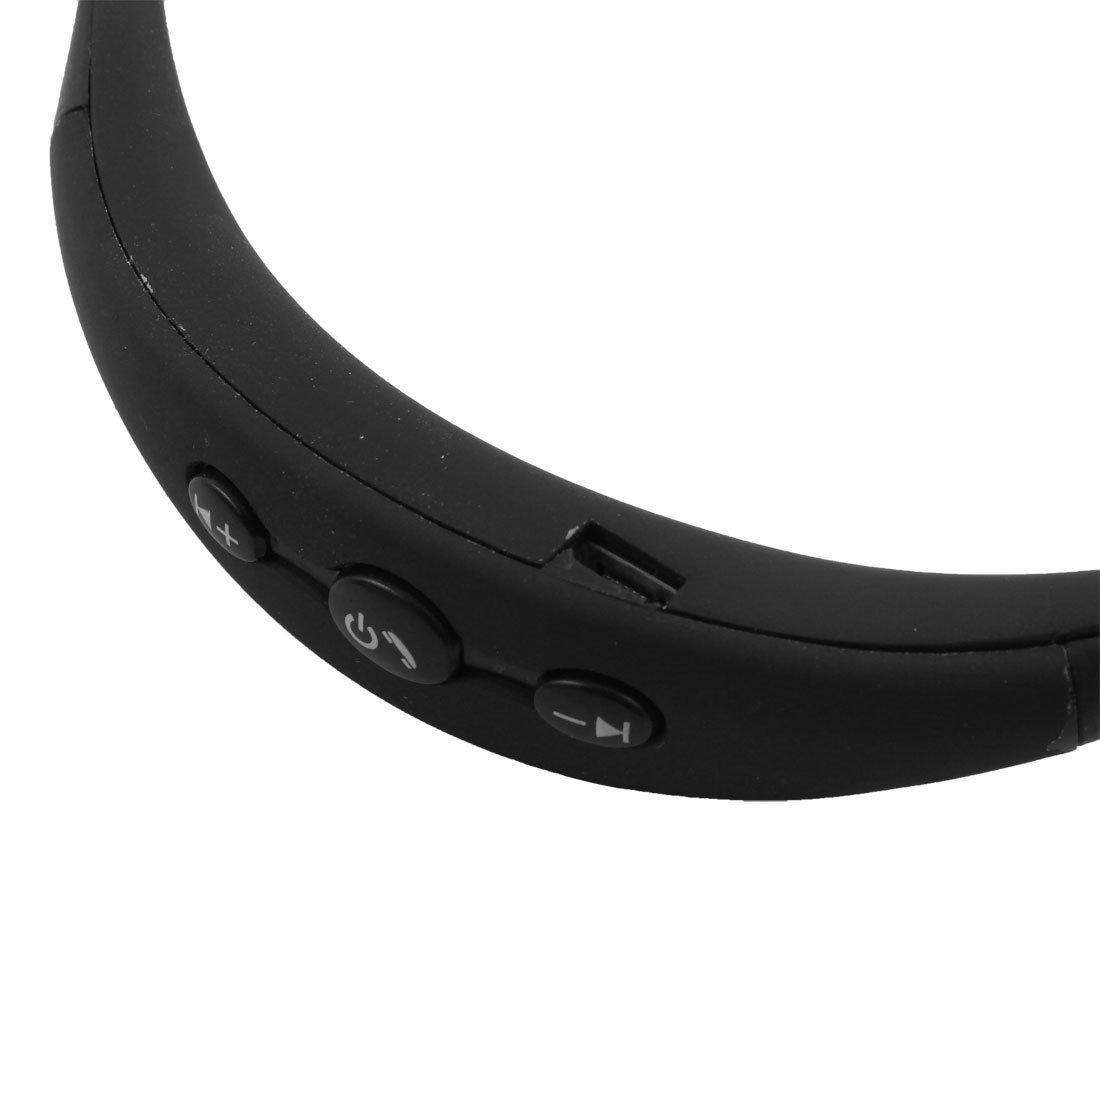 Amazon.com: eDealMax Deportes estéreo Bluetooth Manos libres inalámbrico colgante del Cuello Auriculares Auricular Negro: Electronics